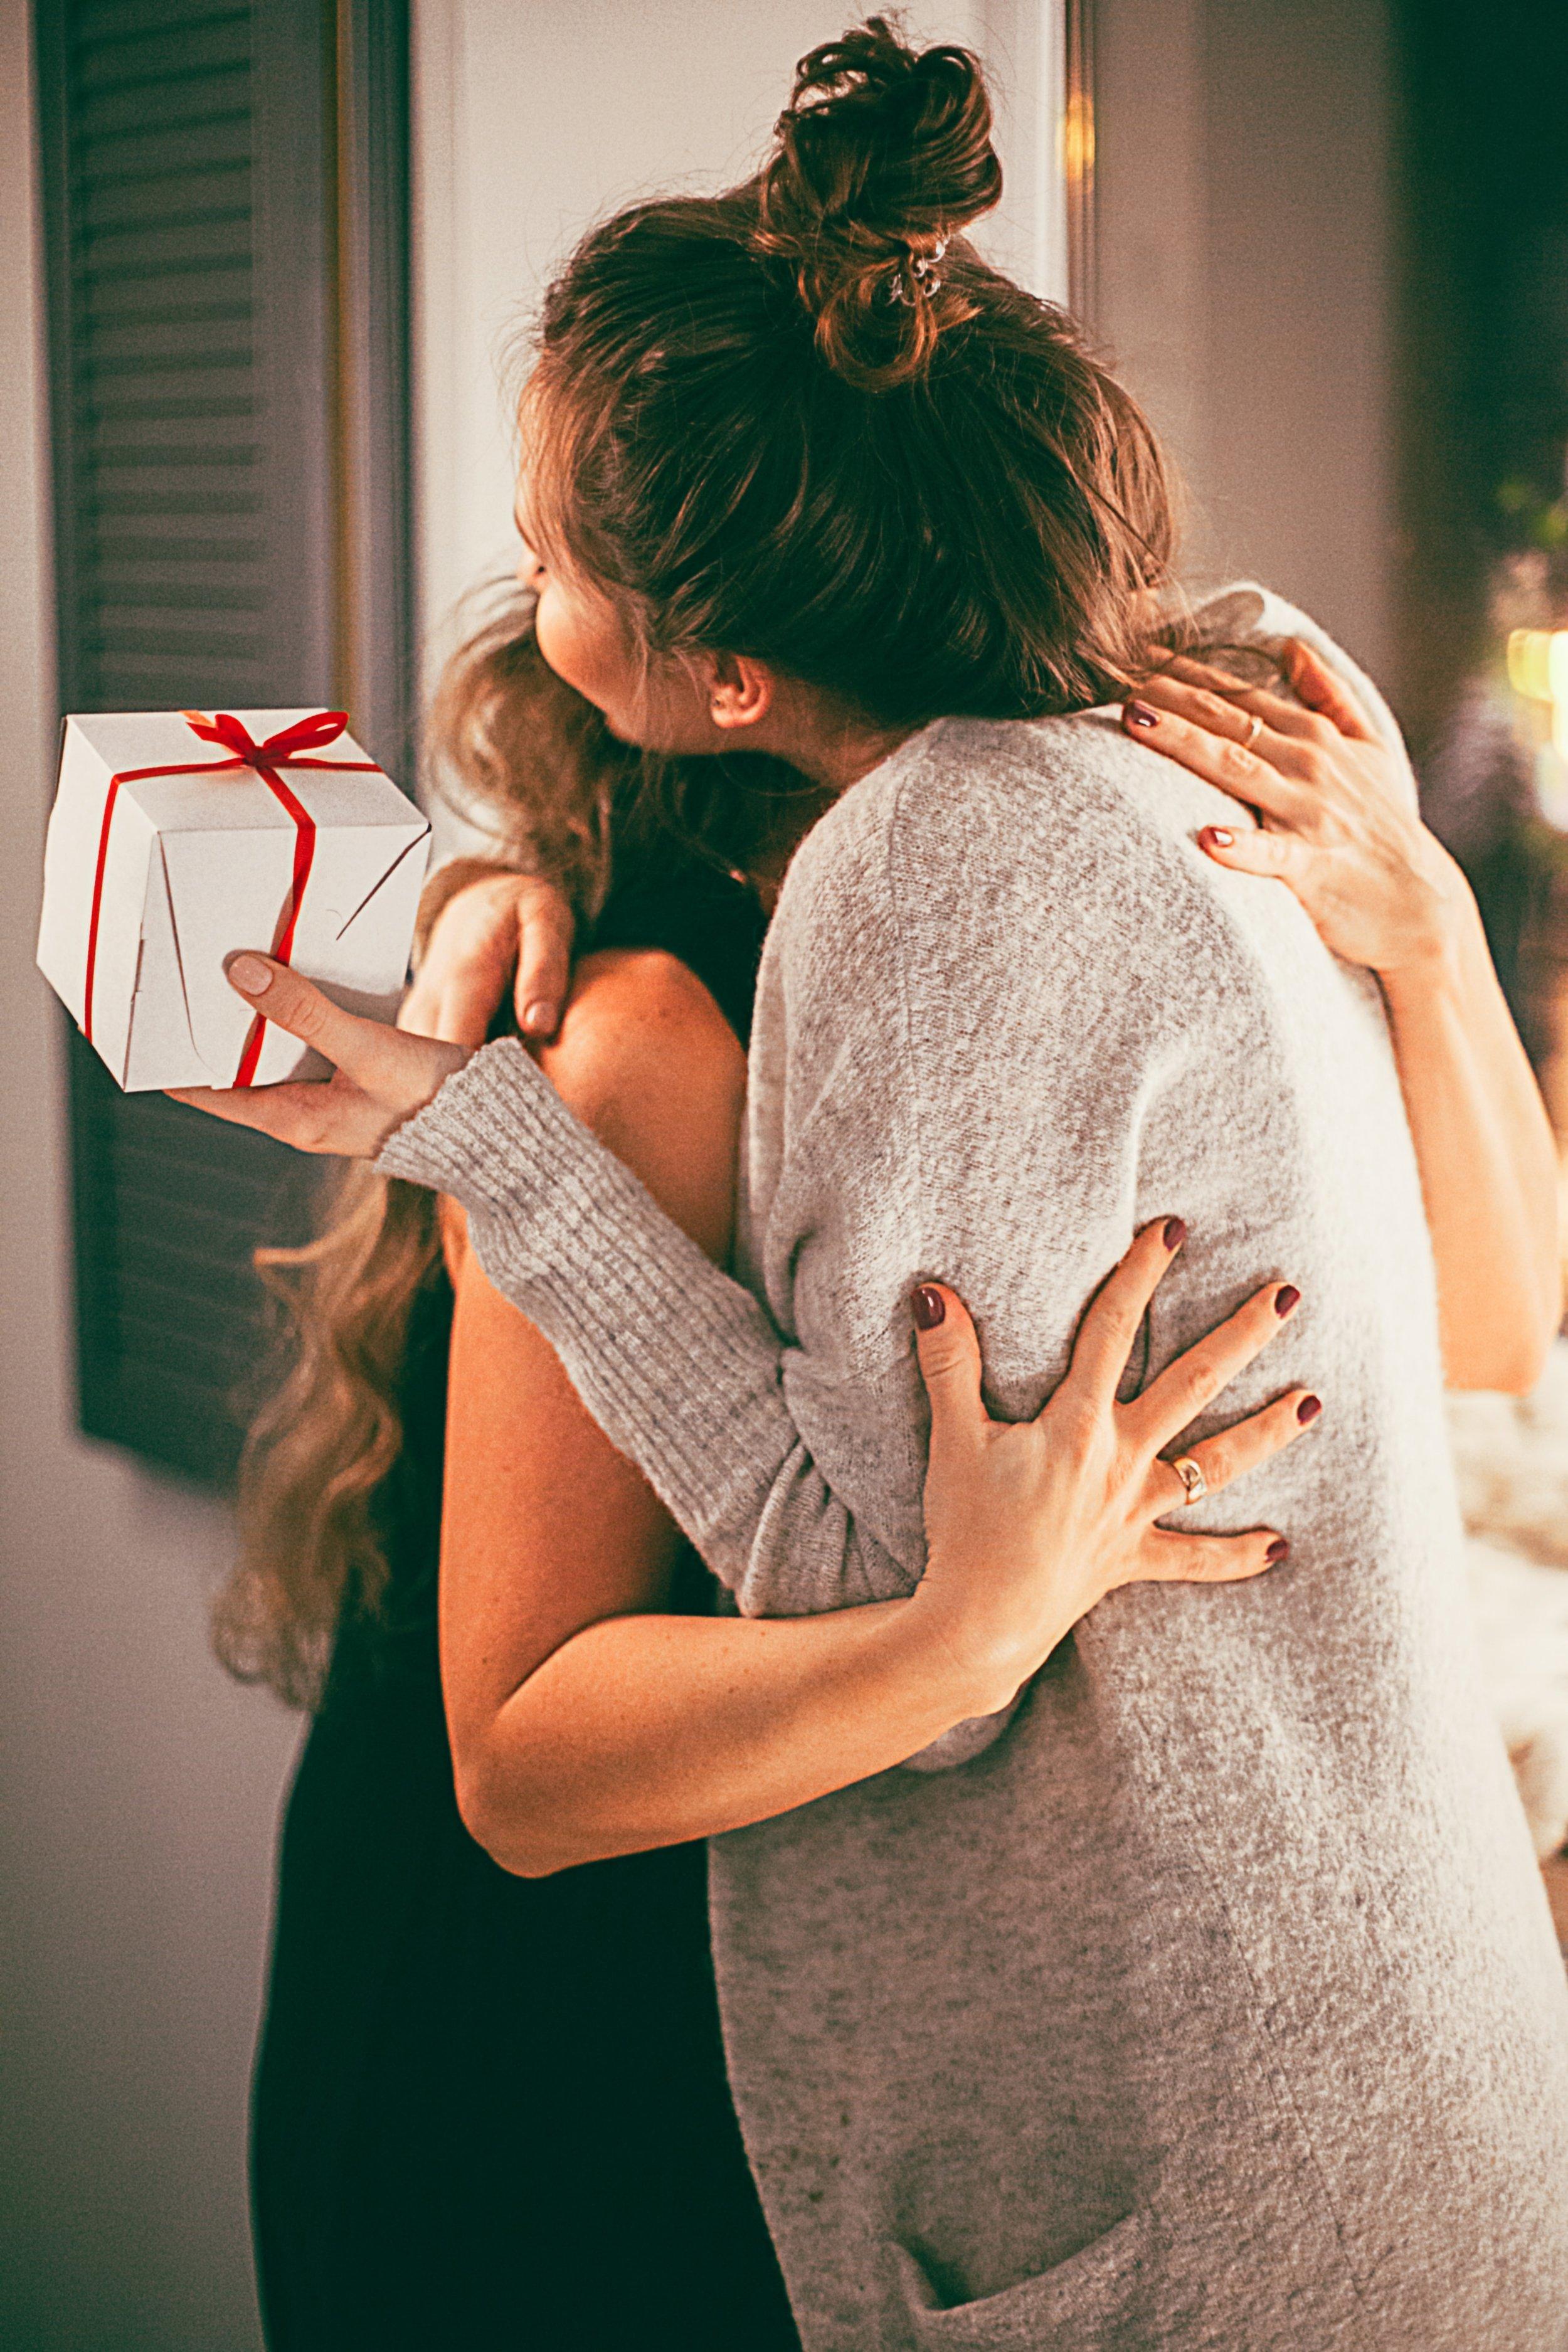 adults-affection-christmas-family-1261368.jpg